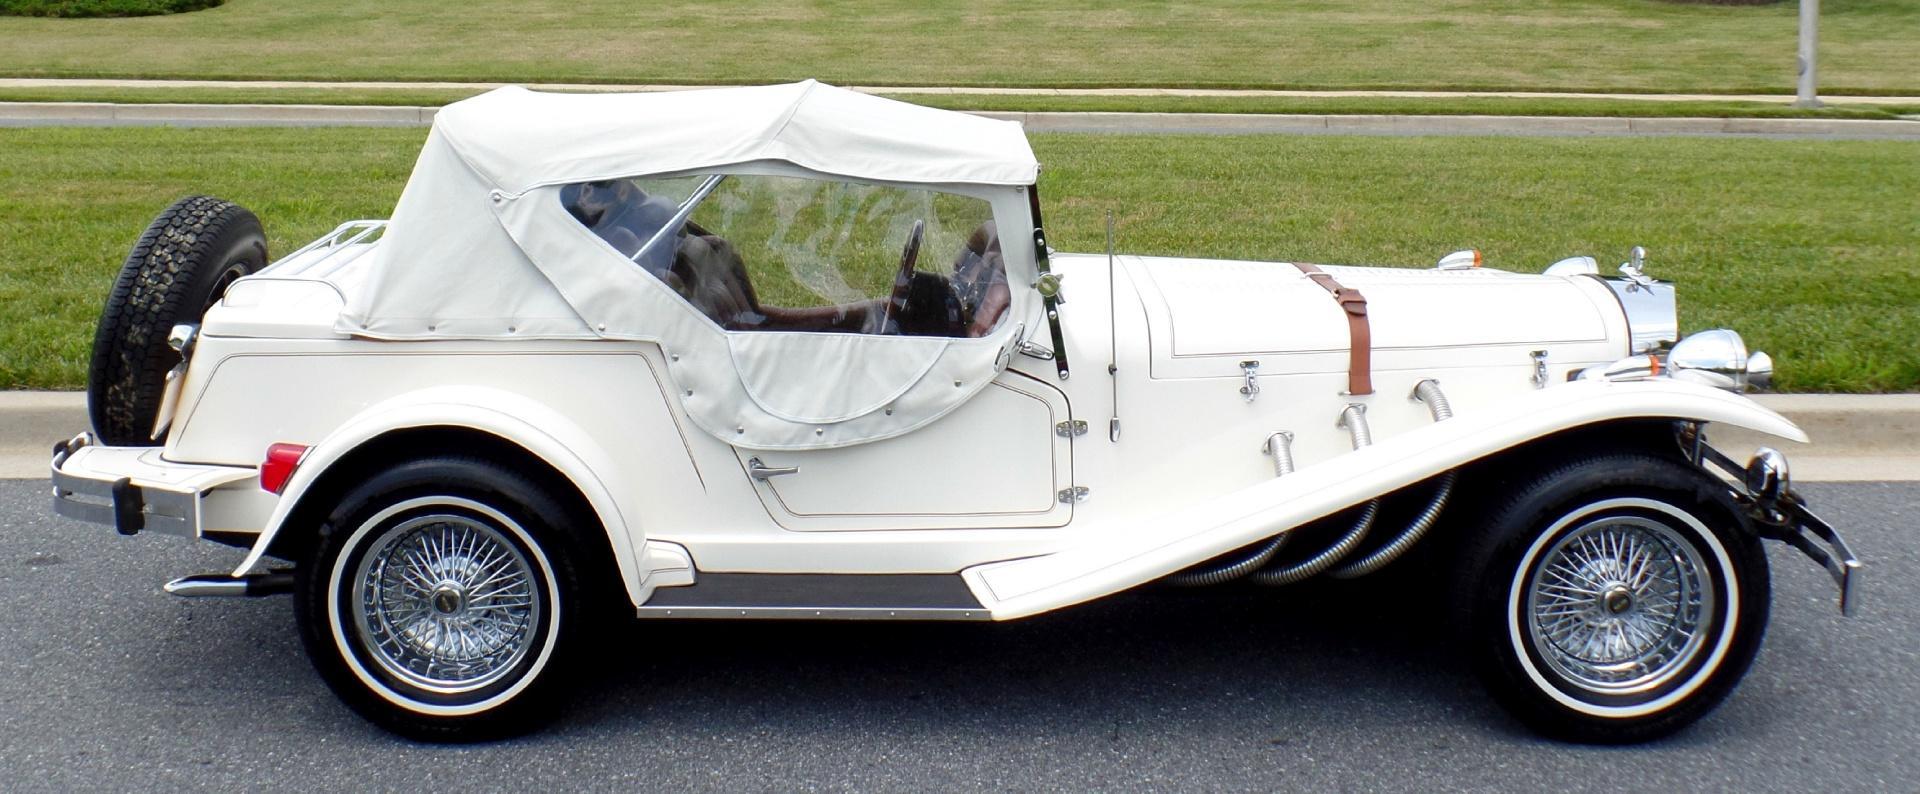 1929 mercedes benz ssk replica roadster for 1929 mercedes benz